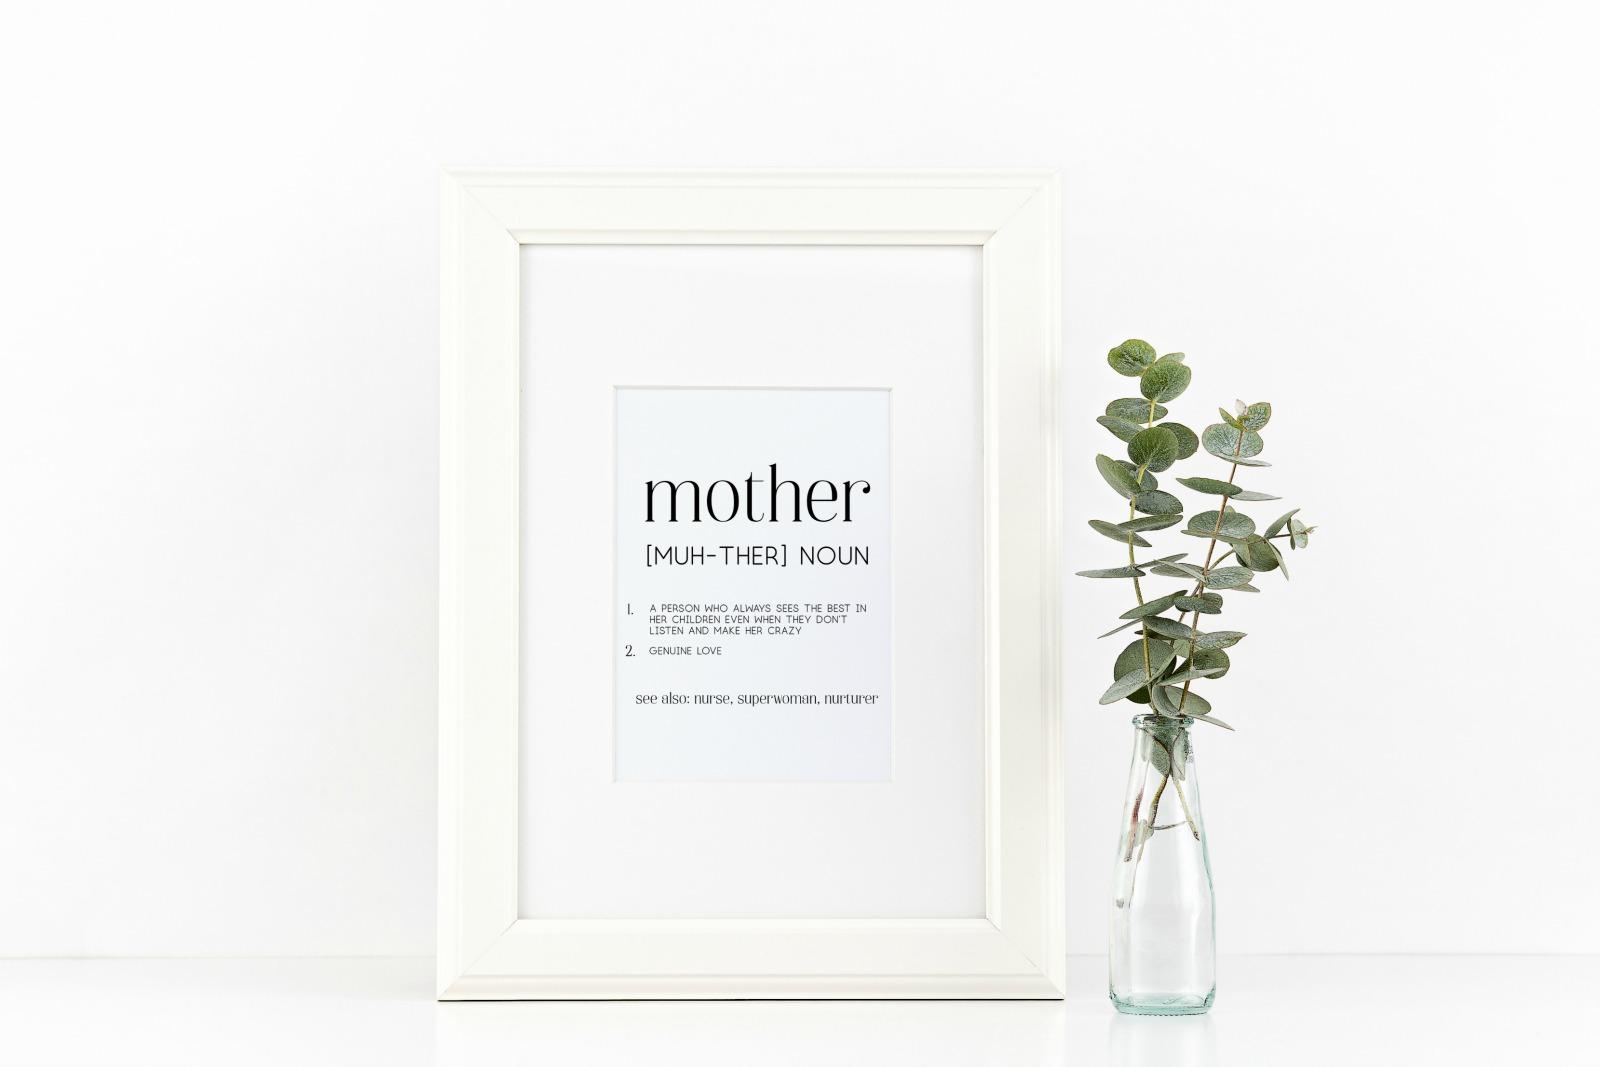 mother definition art